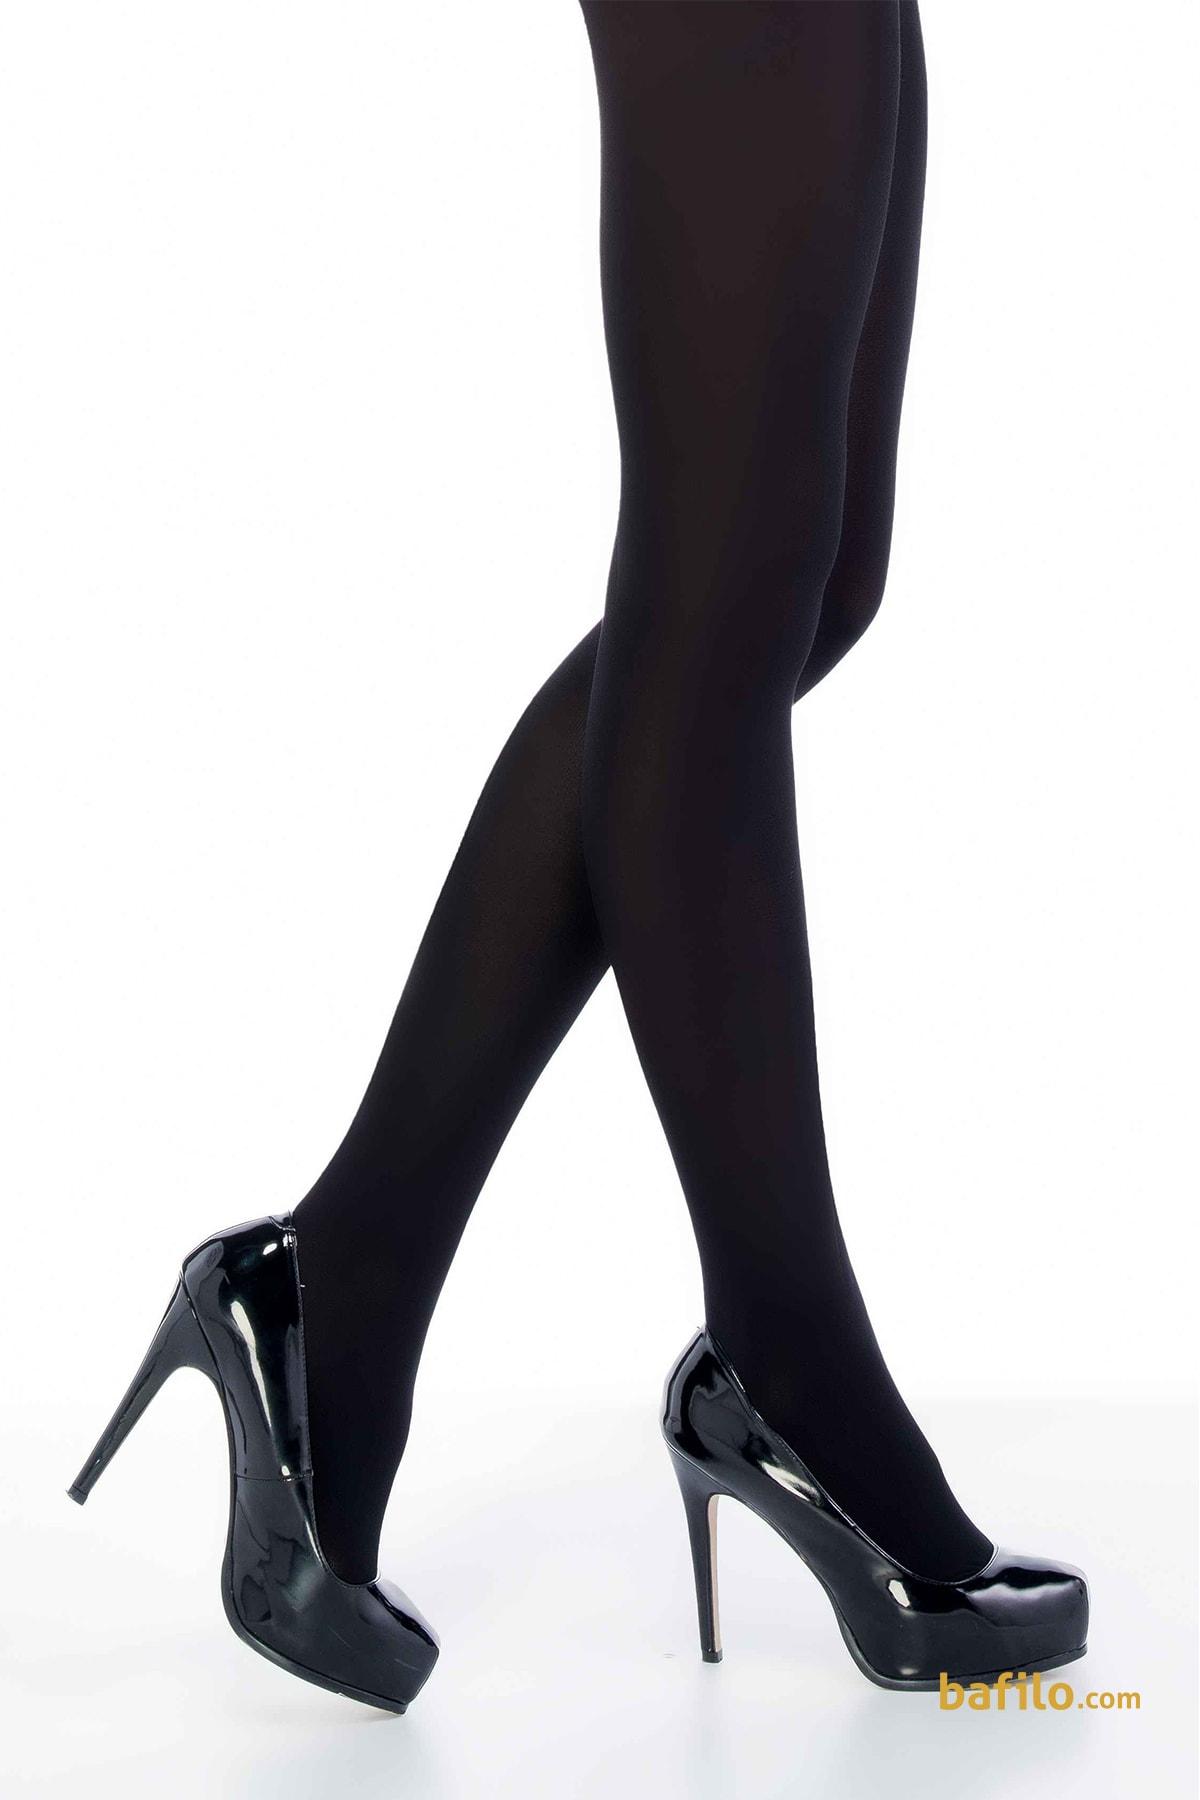 پنتی | Penti - جوراب شلواری ابریشم زنانه پنتی Ipek مشکی